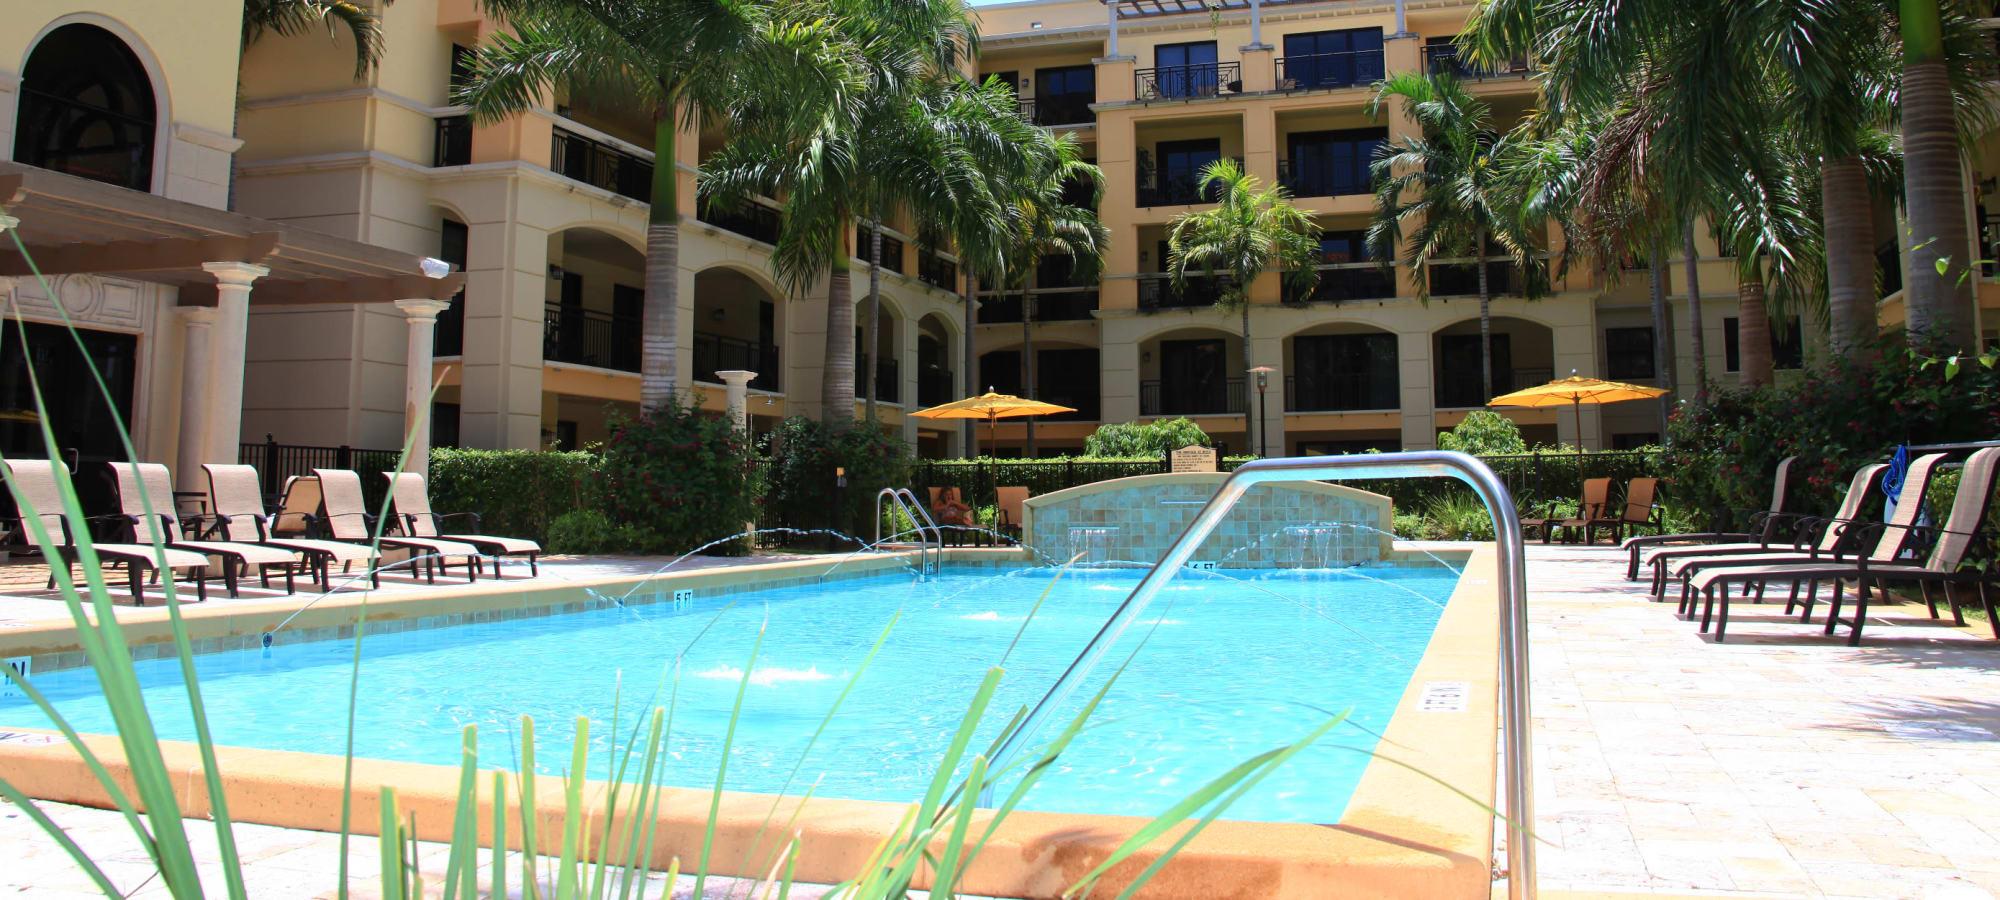 The Heritage at Boca Raton apartments in Boca Raton, Florida